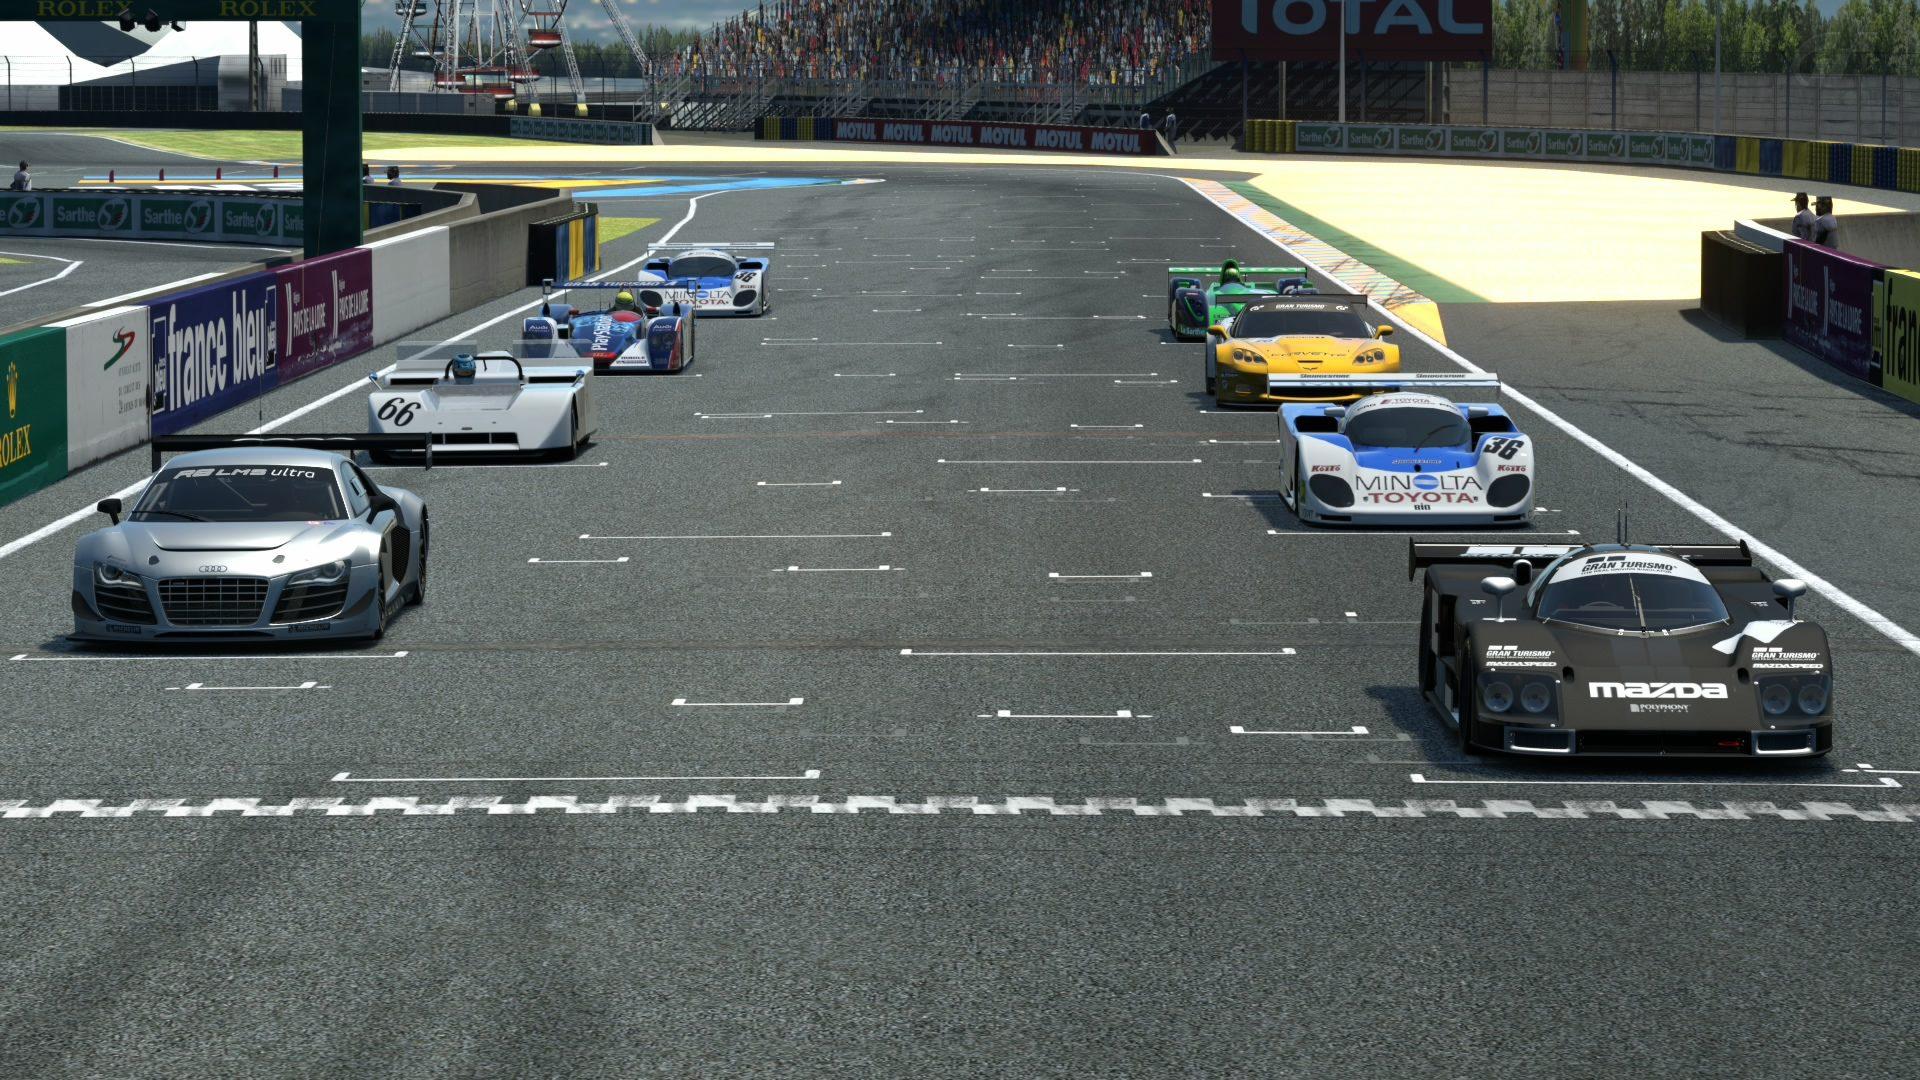 Circuit de la Sarthe 2013 (3).jpg